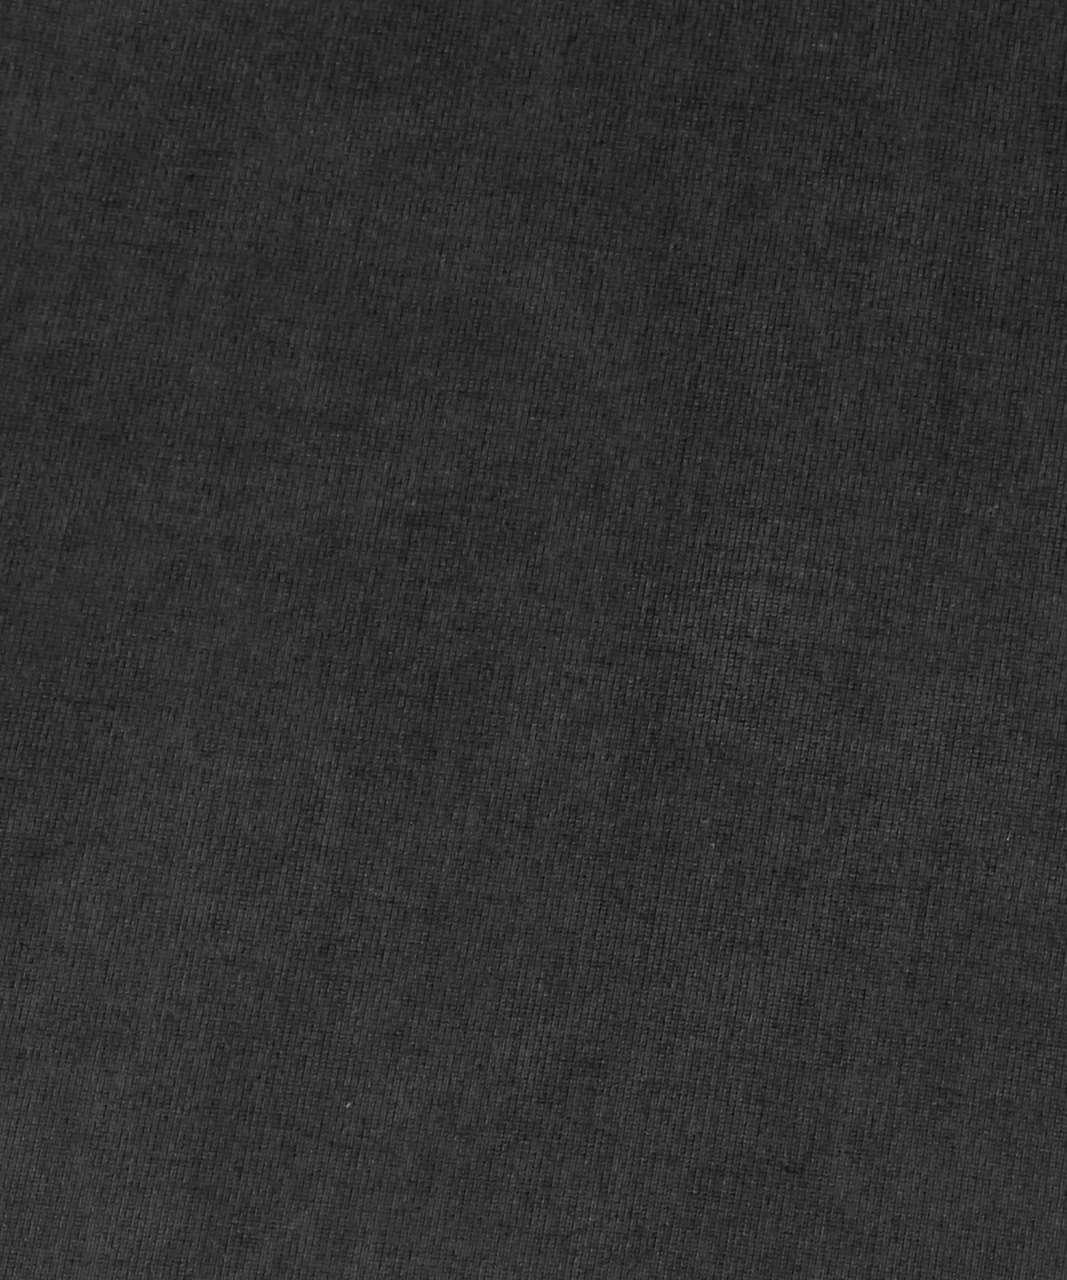 Lululemon Flutter Tank *lululemon lab - Black